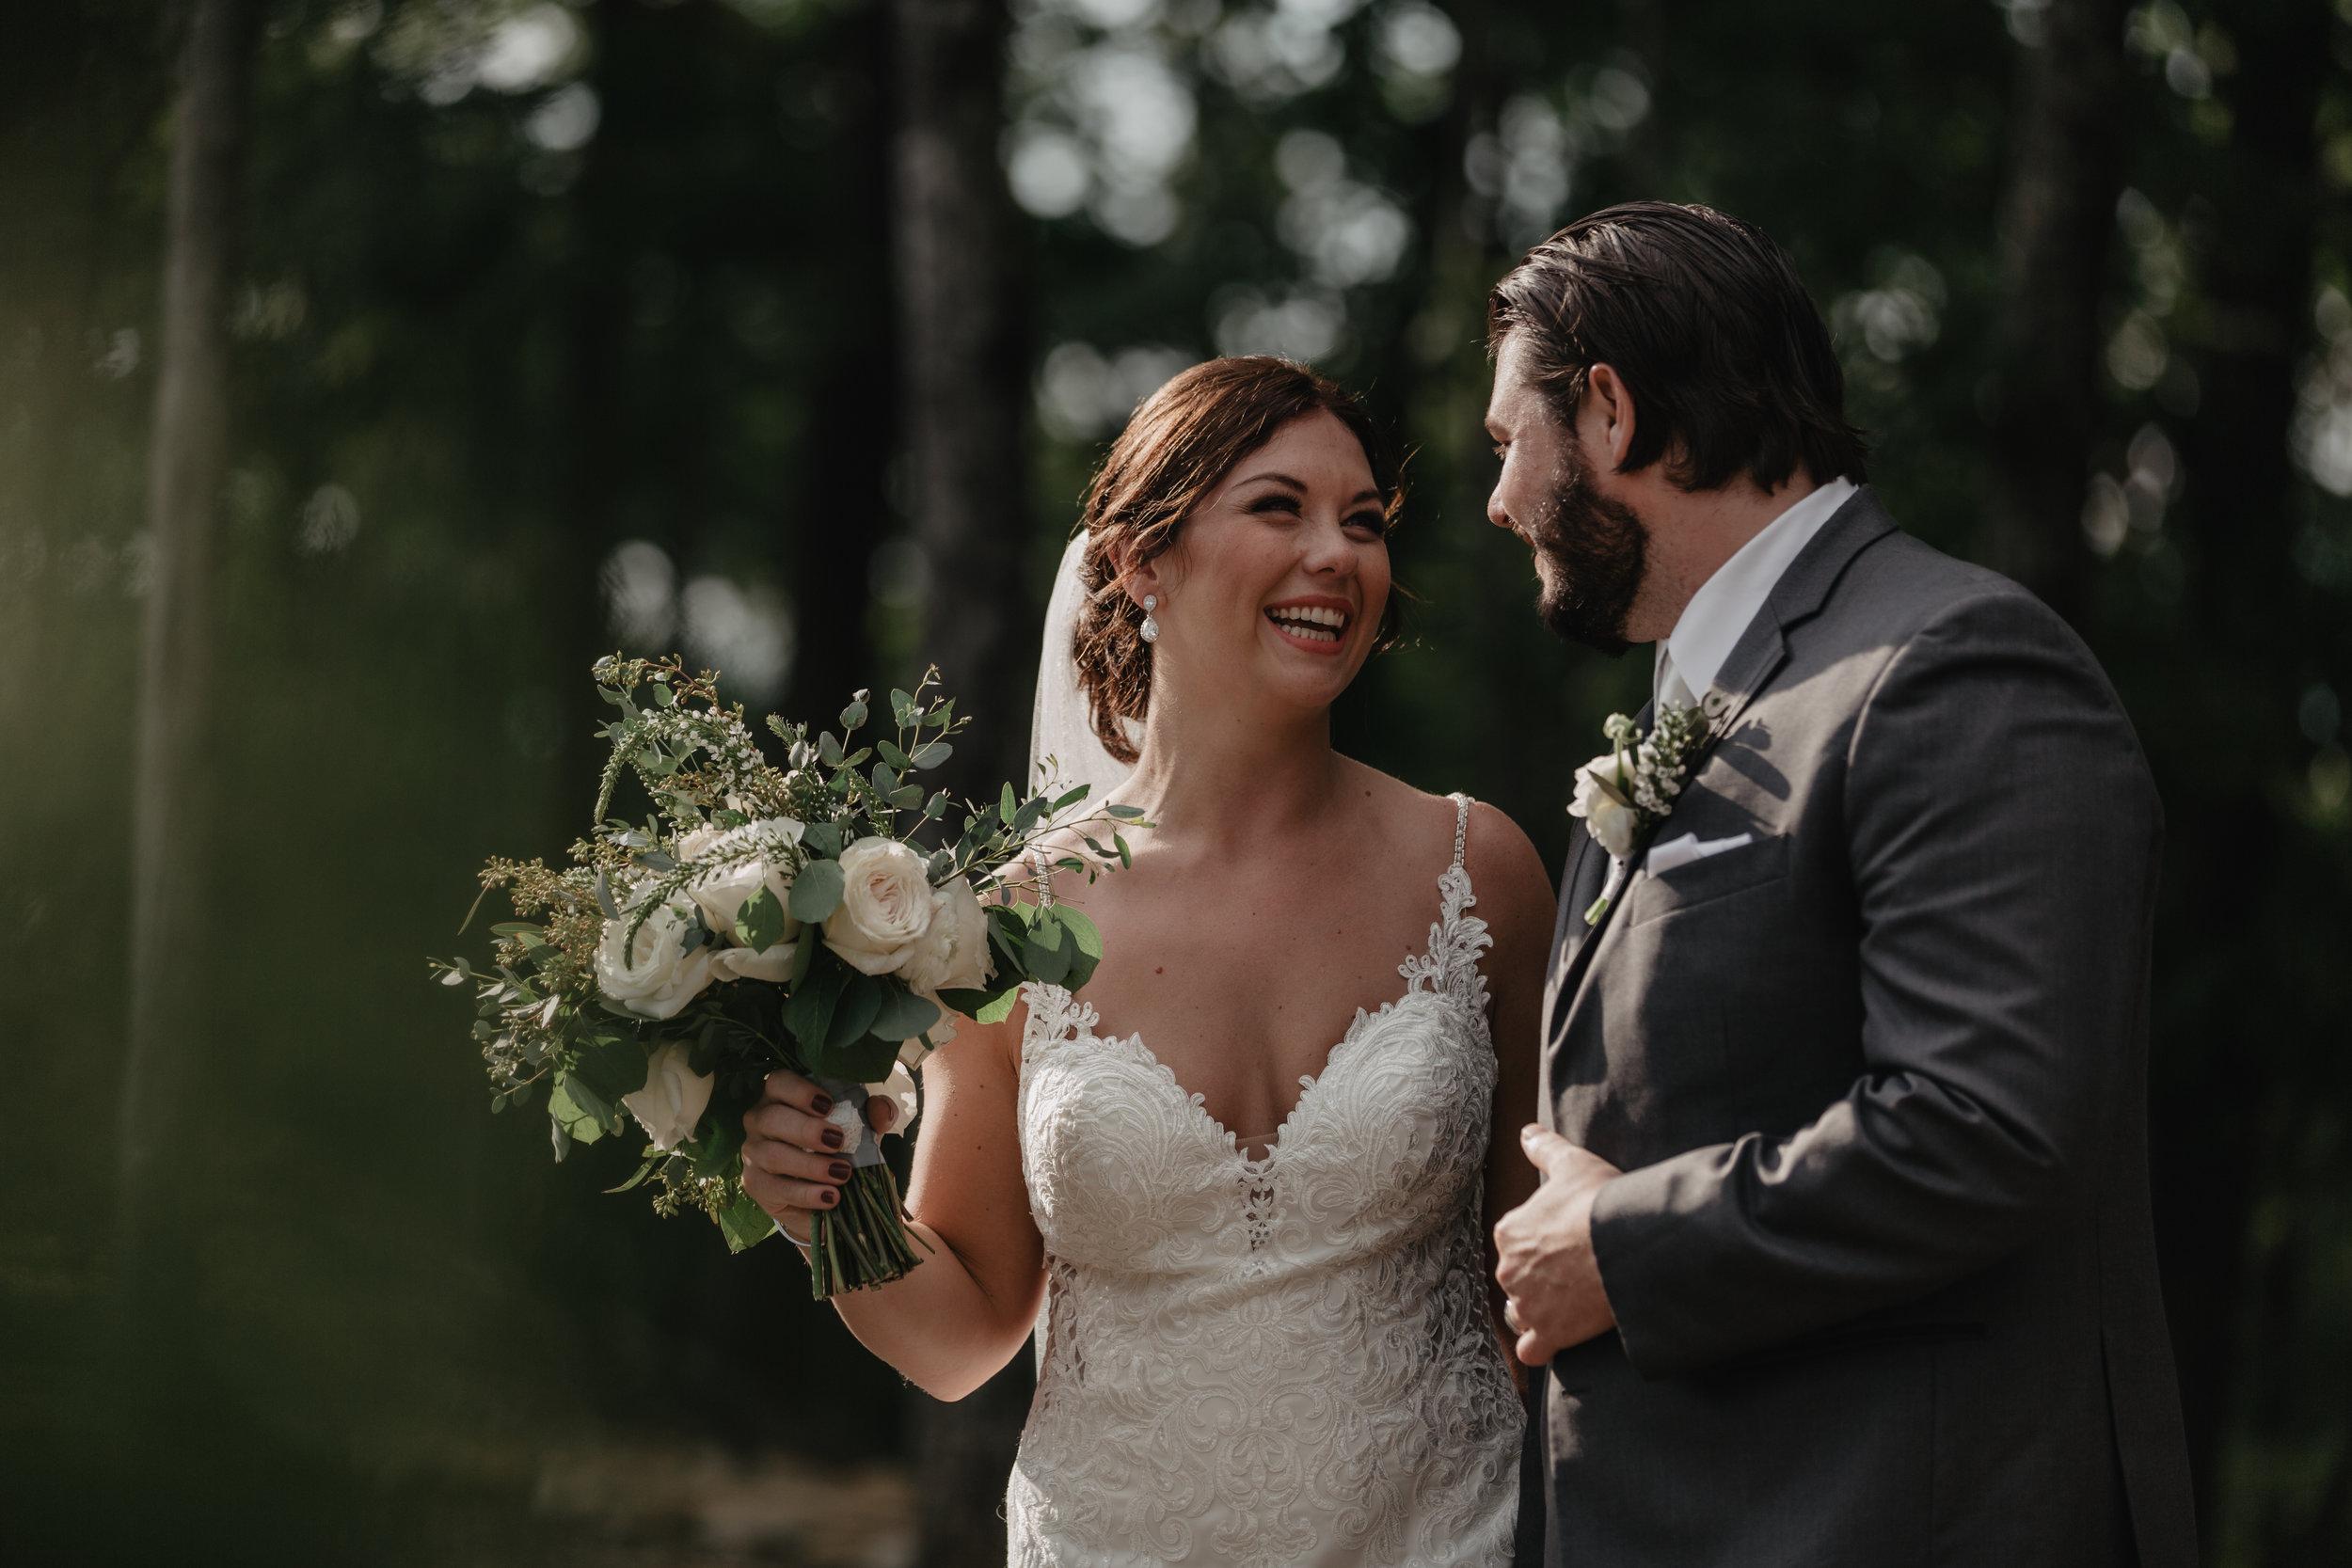 The Magnolia Smoky Mountains | Knoxville Wedding Photographer